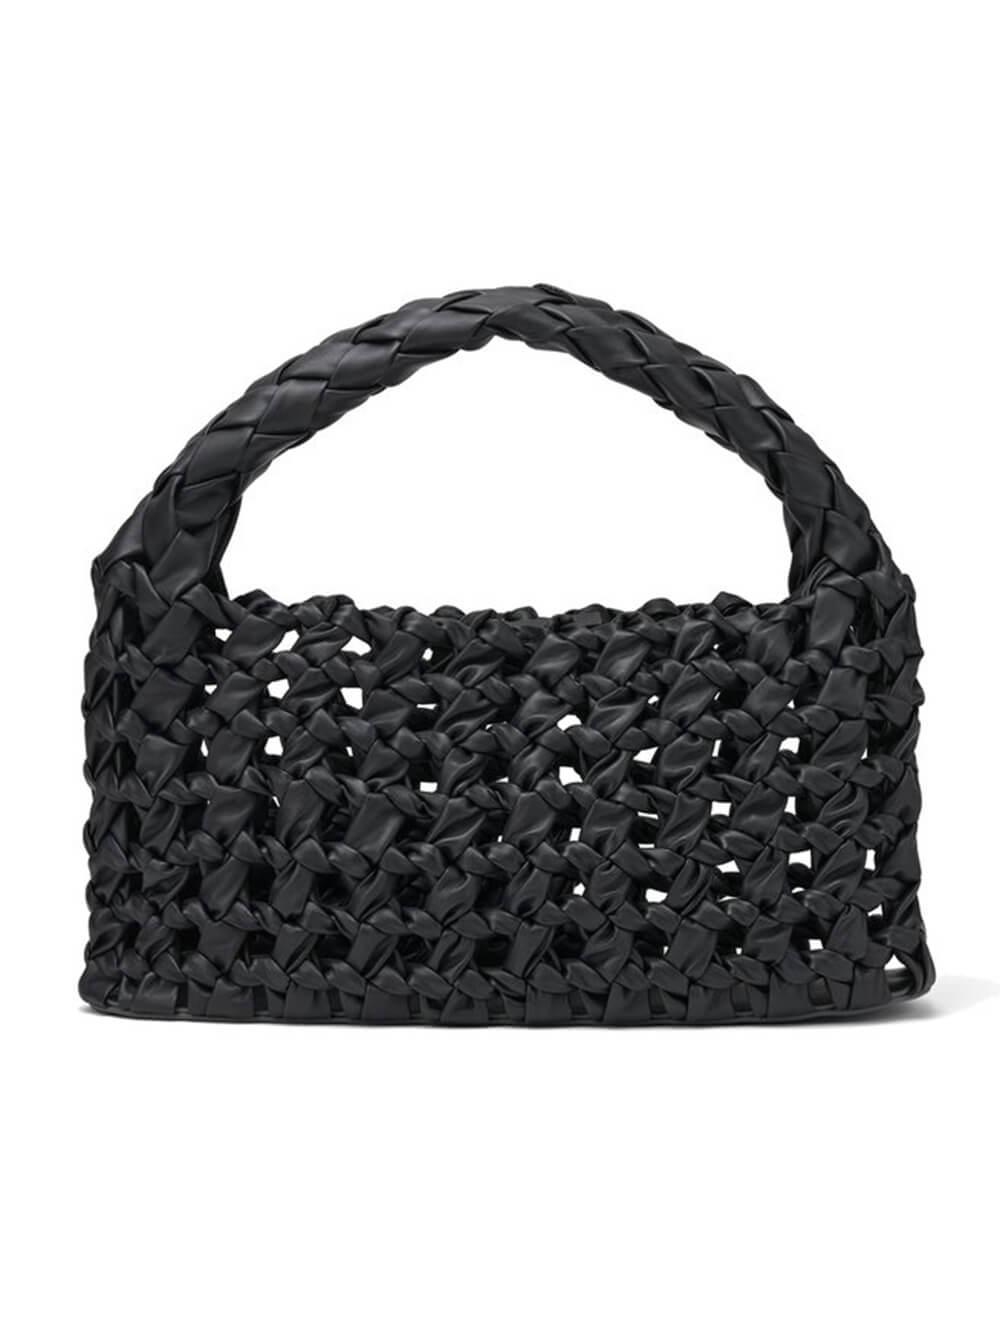 Lola Weave Bag Item # S21-46-3374